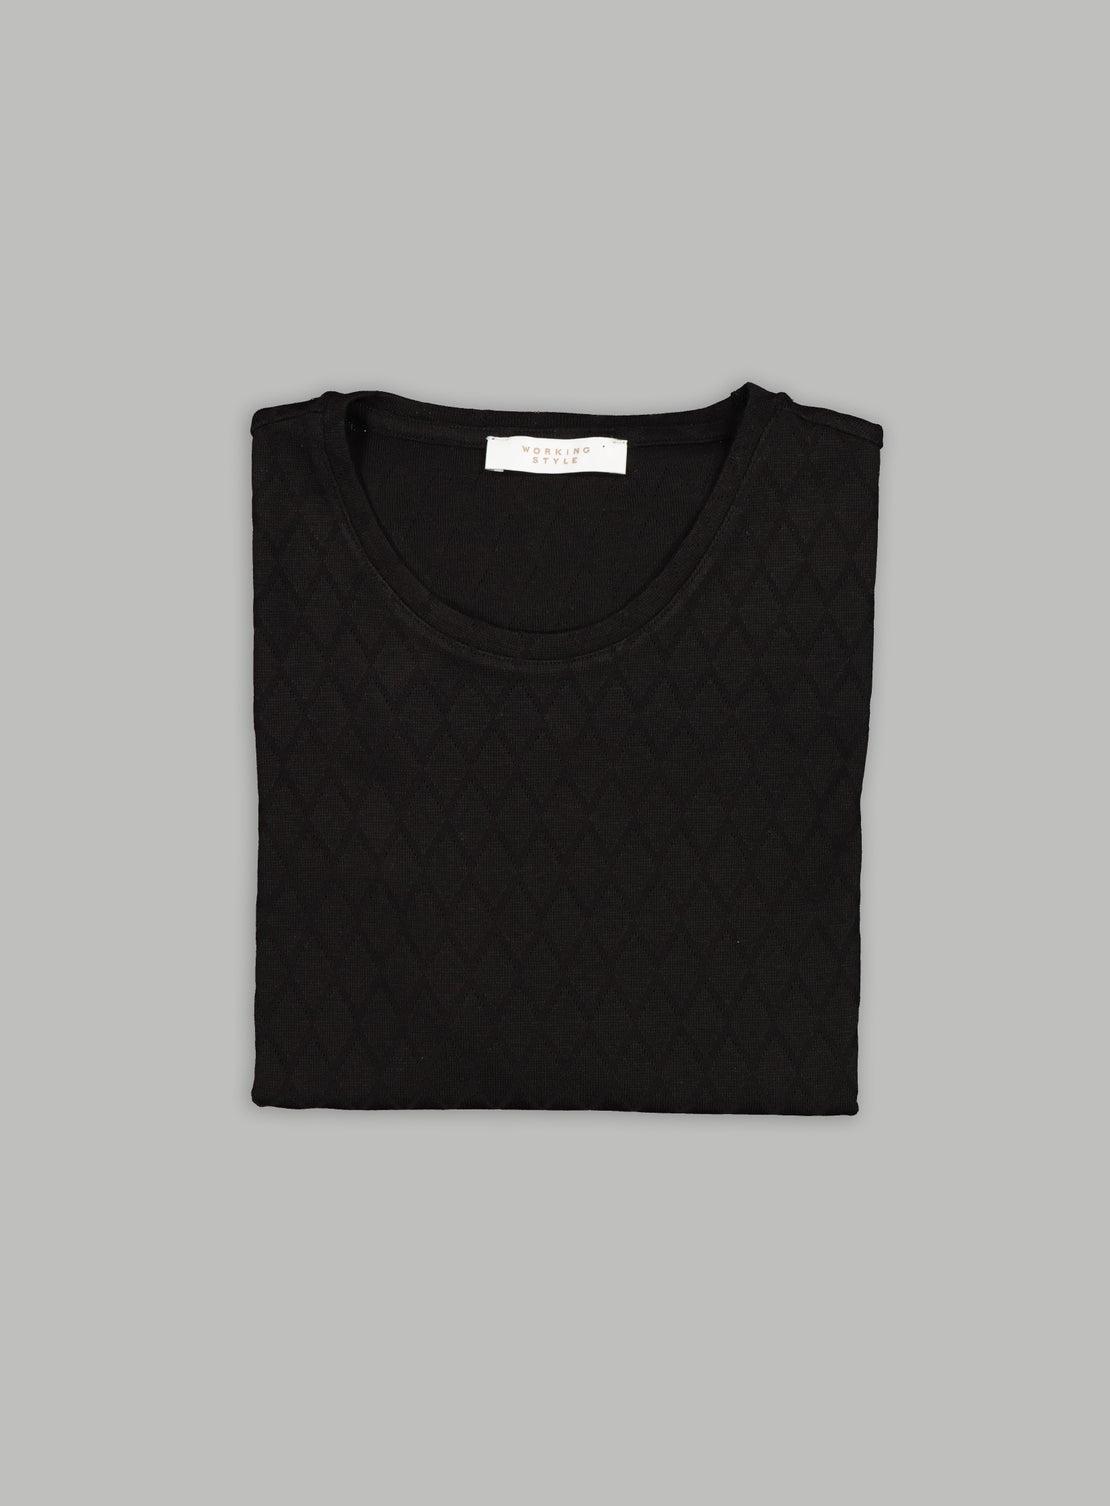 Florian Black Diamond Knitted T-Shirt